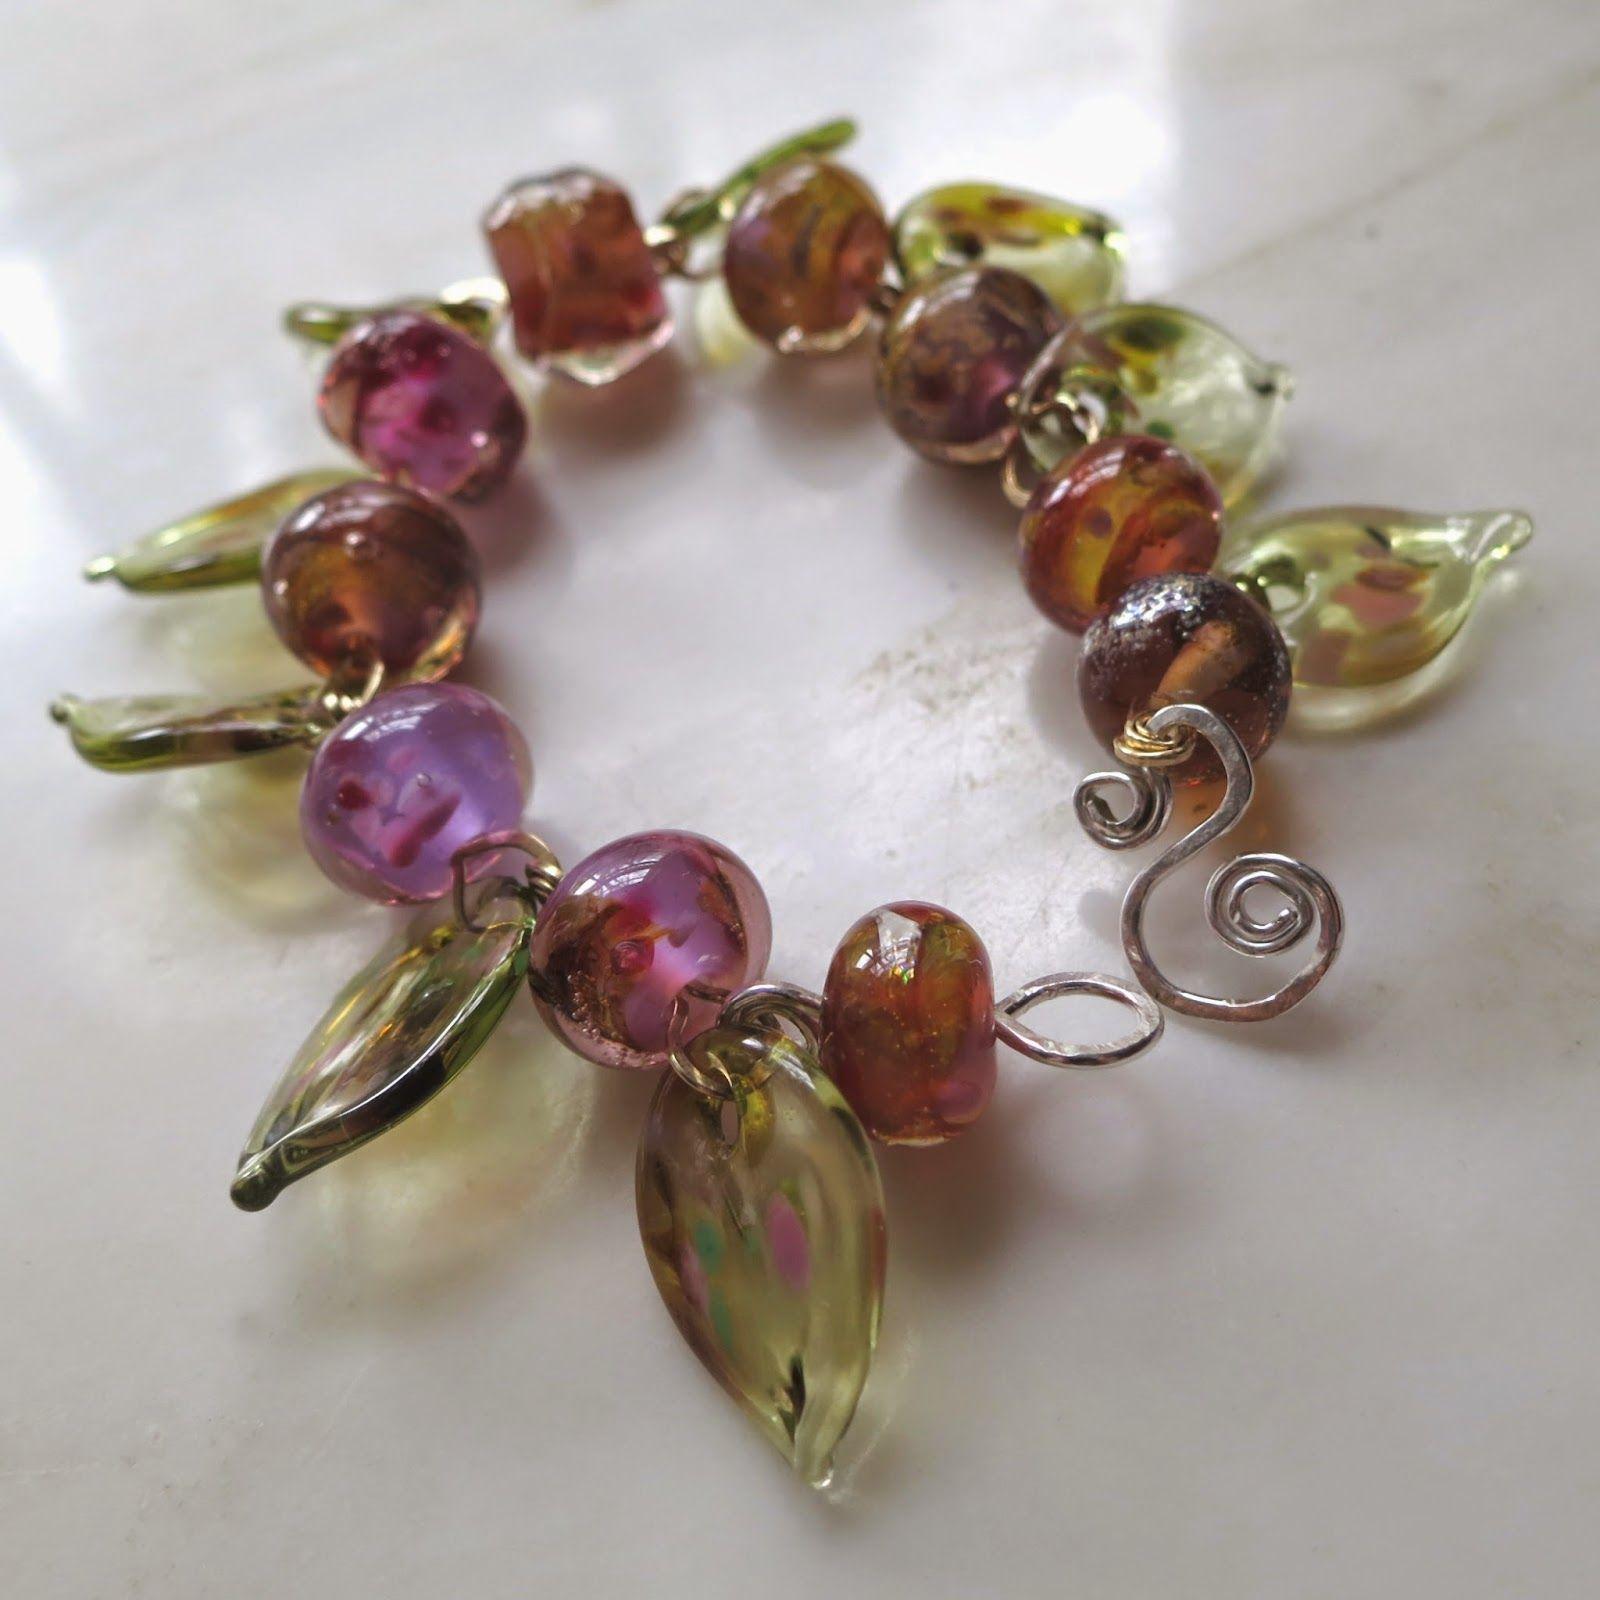 Lucinda Storms : Belvedere Beads - 'Pink Berries' bracelet - lampwork glass, bronze & sterling silver